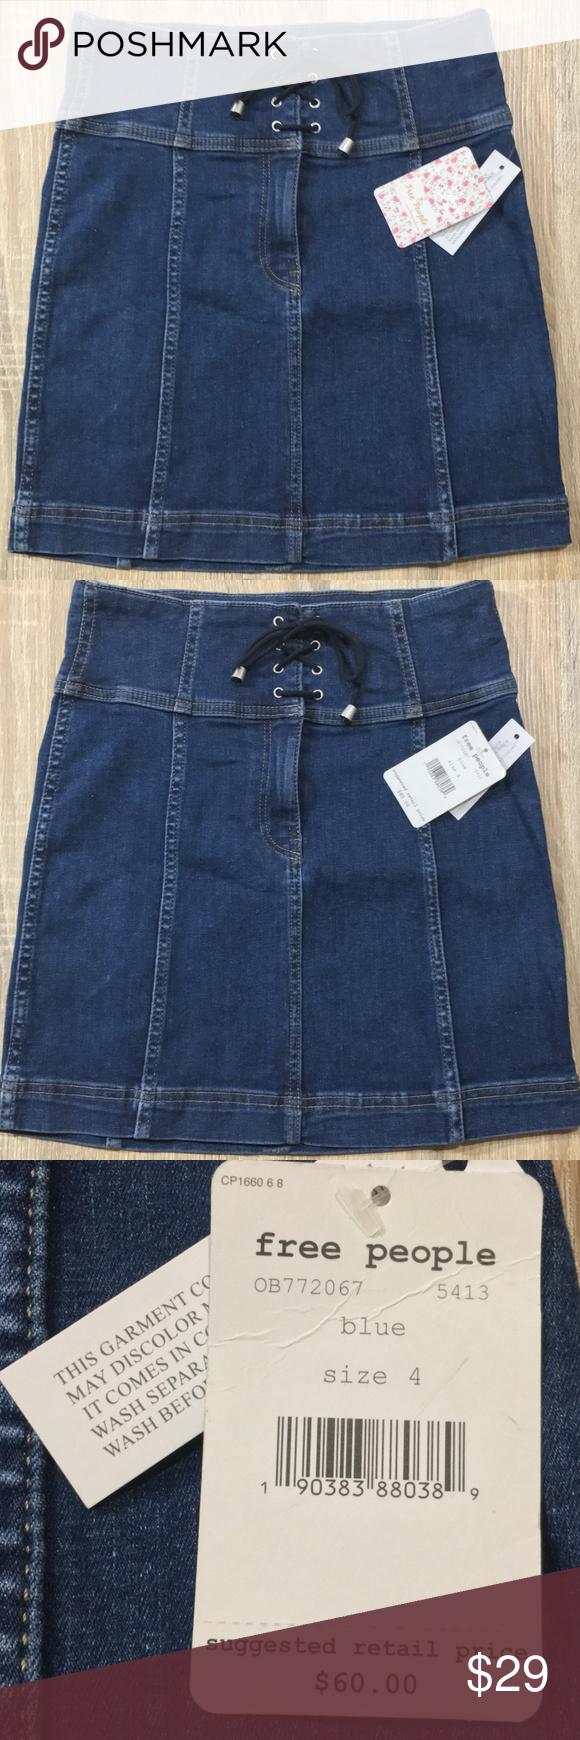 8165fae1c97 Free People Modern Femme Corset Mini Skirt Free People Modern Femme Corset  Mini Skirt OB772067 Blue